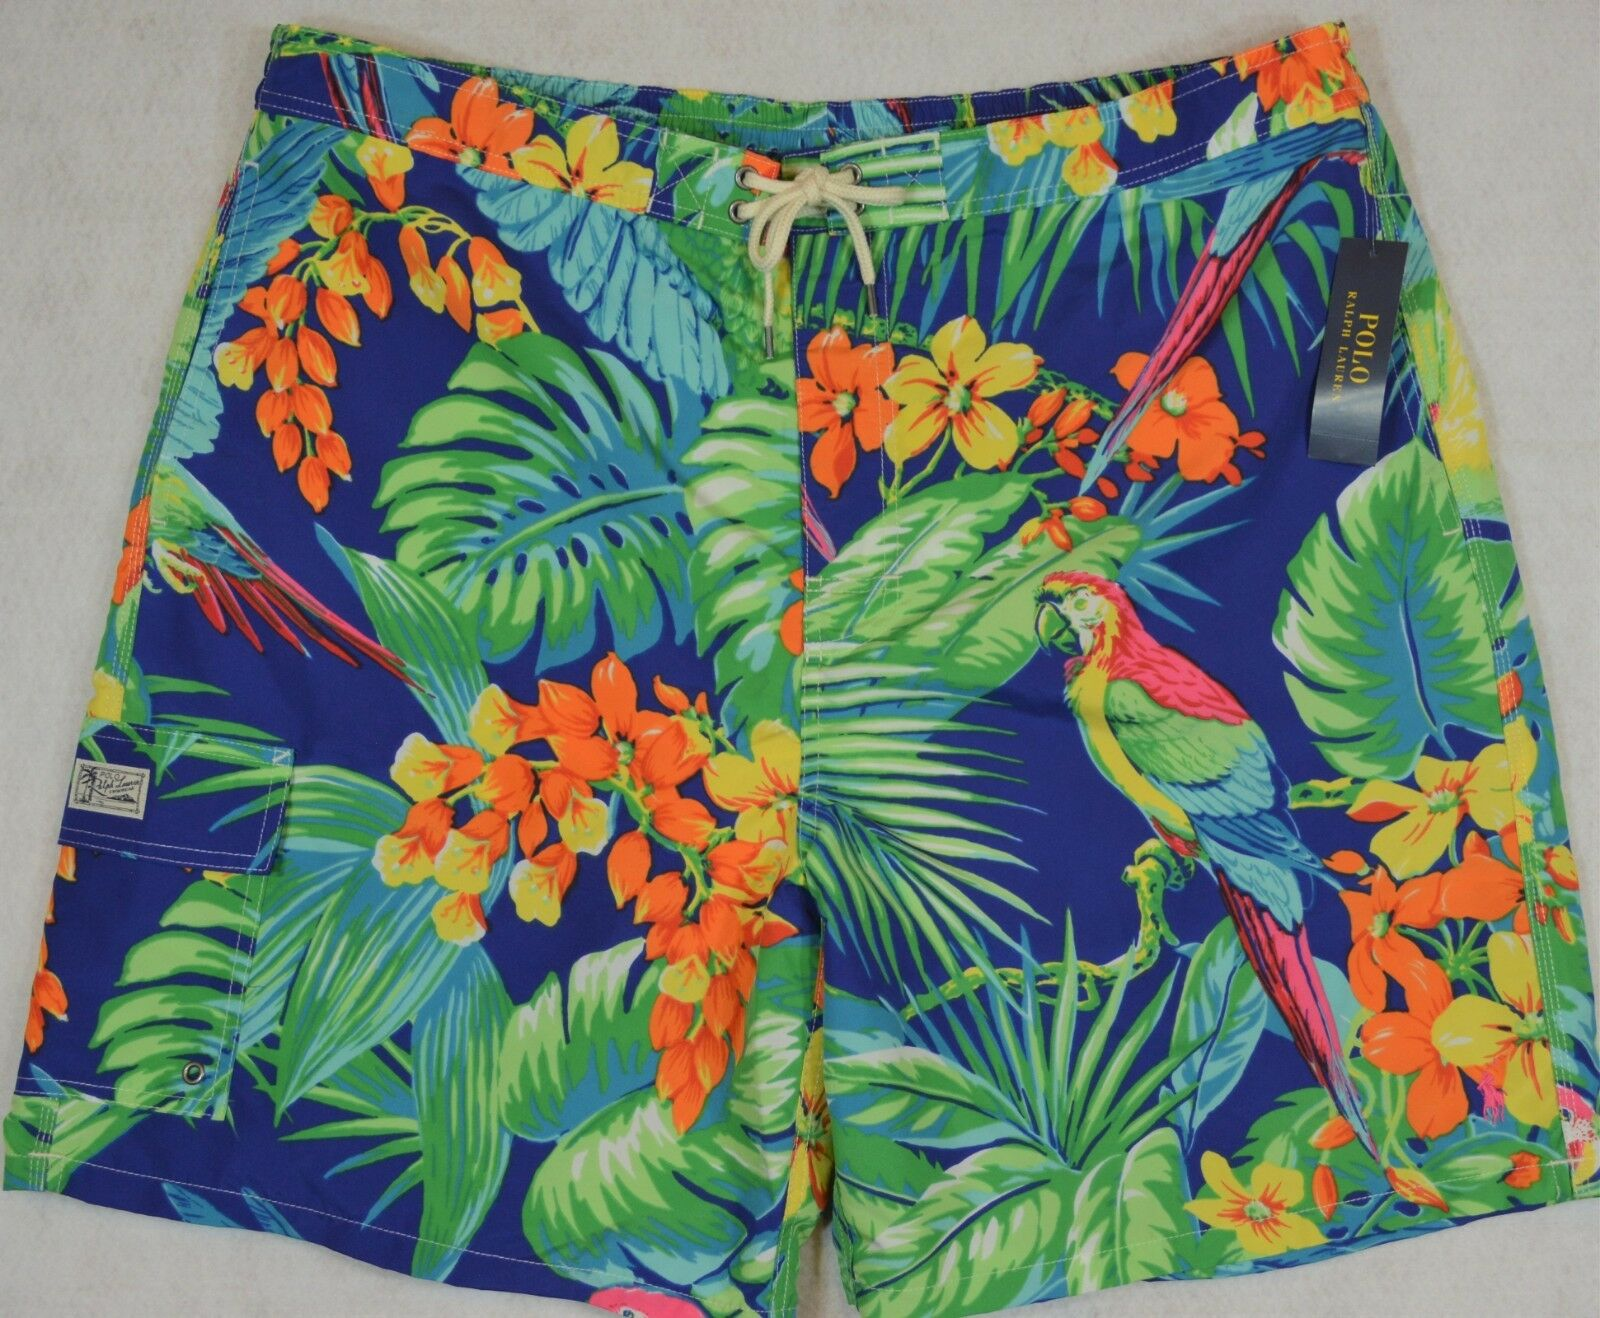 Polo Ralph Lauren Swim Trunks Board Shorts bluee Jungle Parreds 3XB 3X NWT